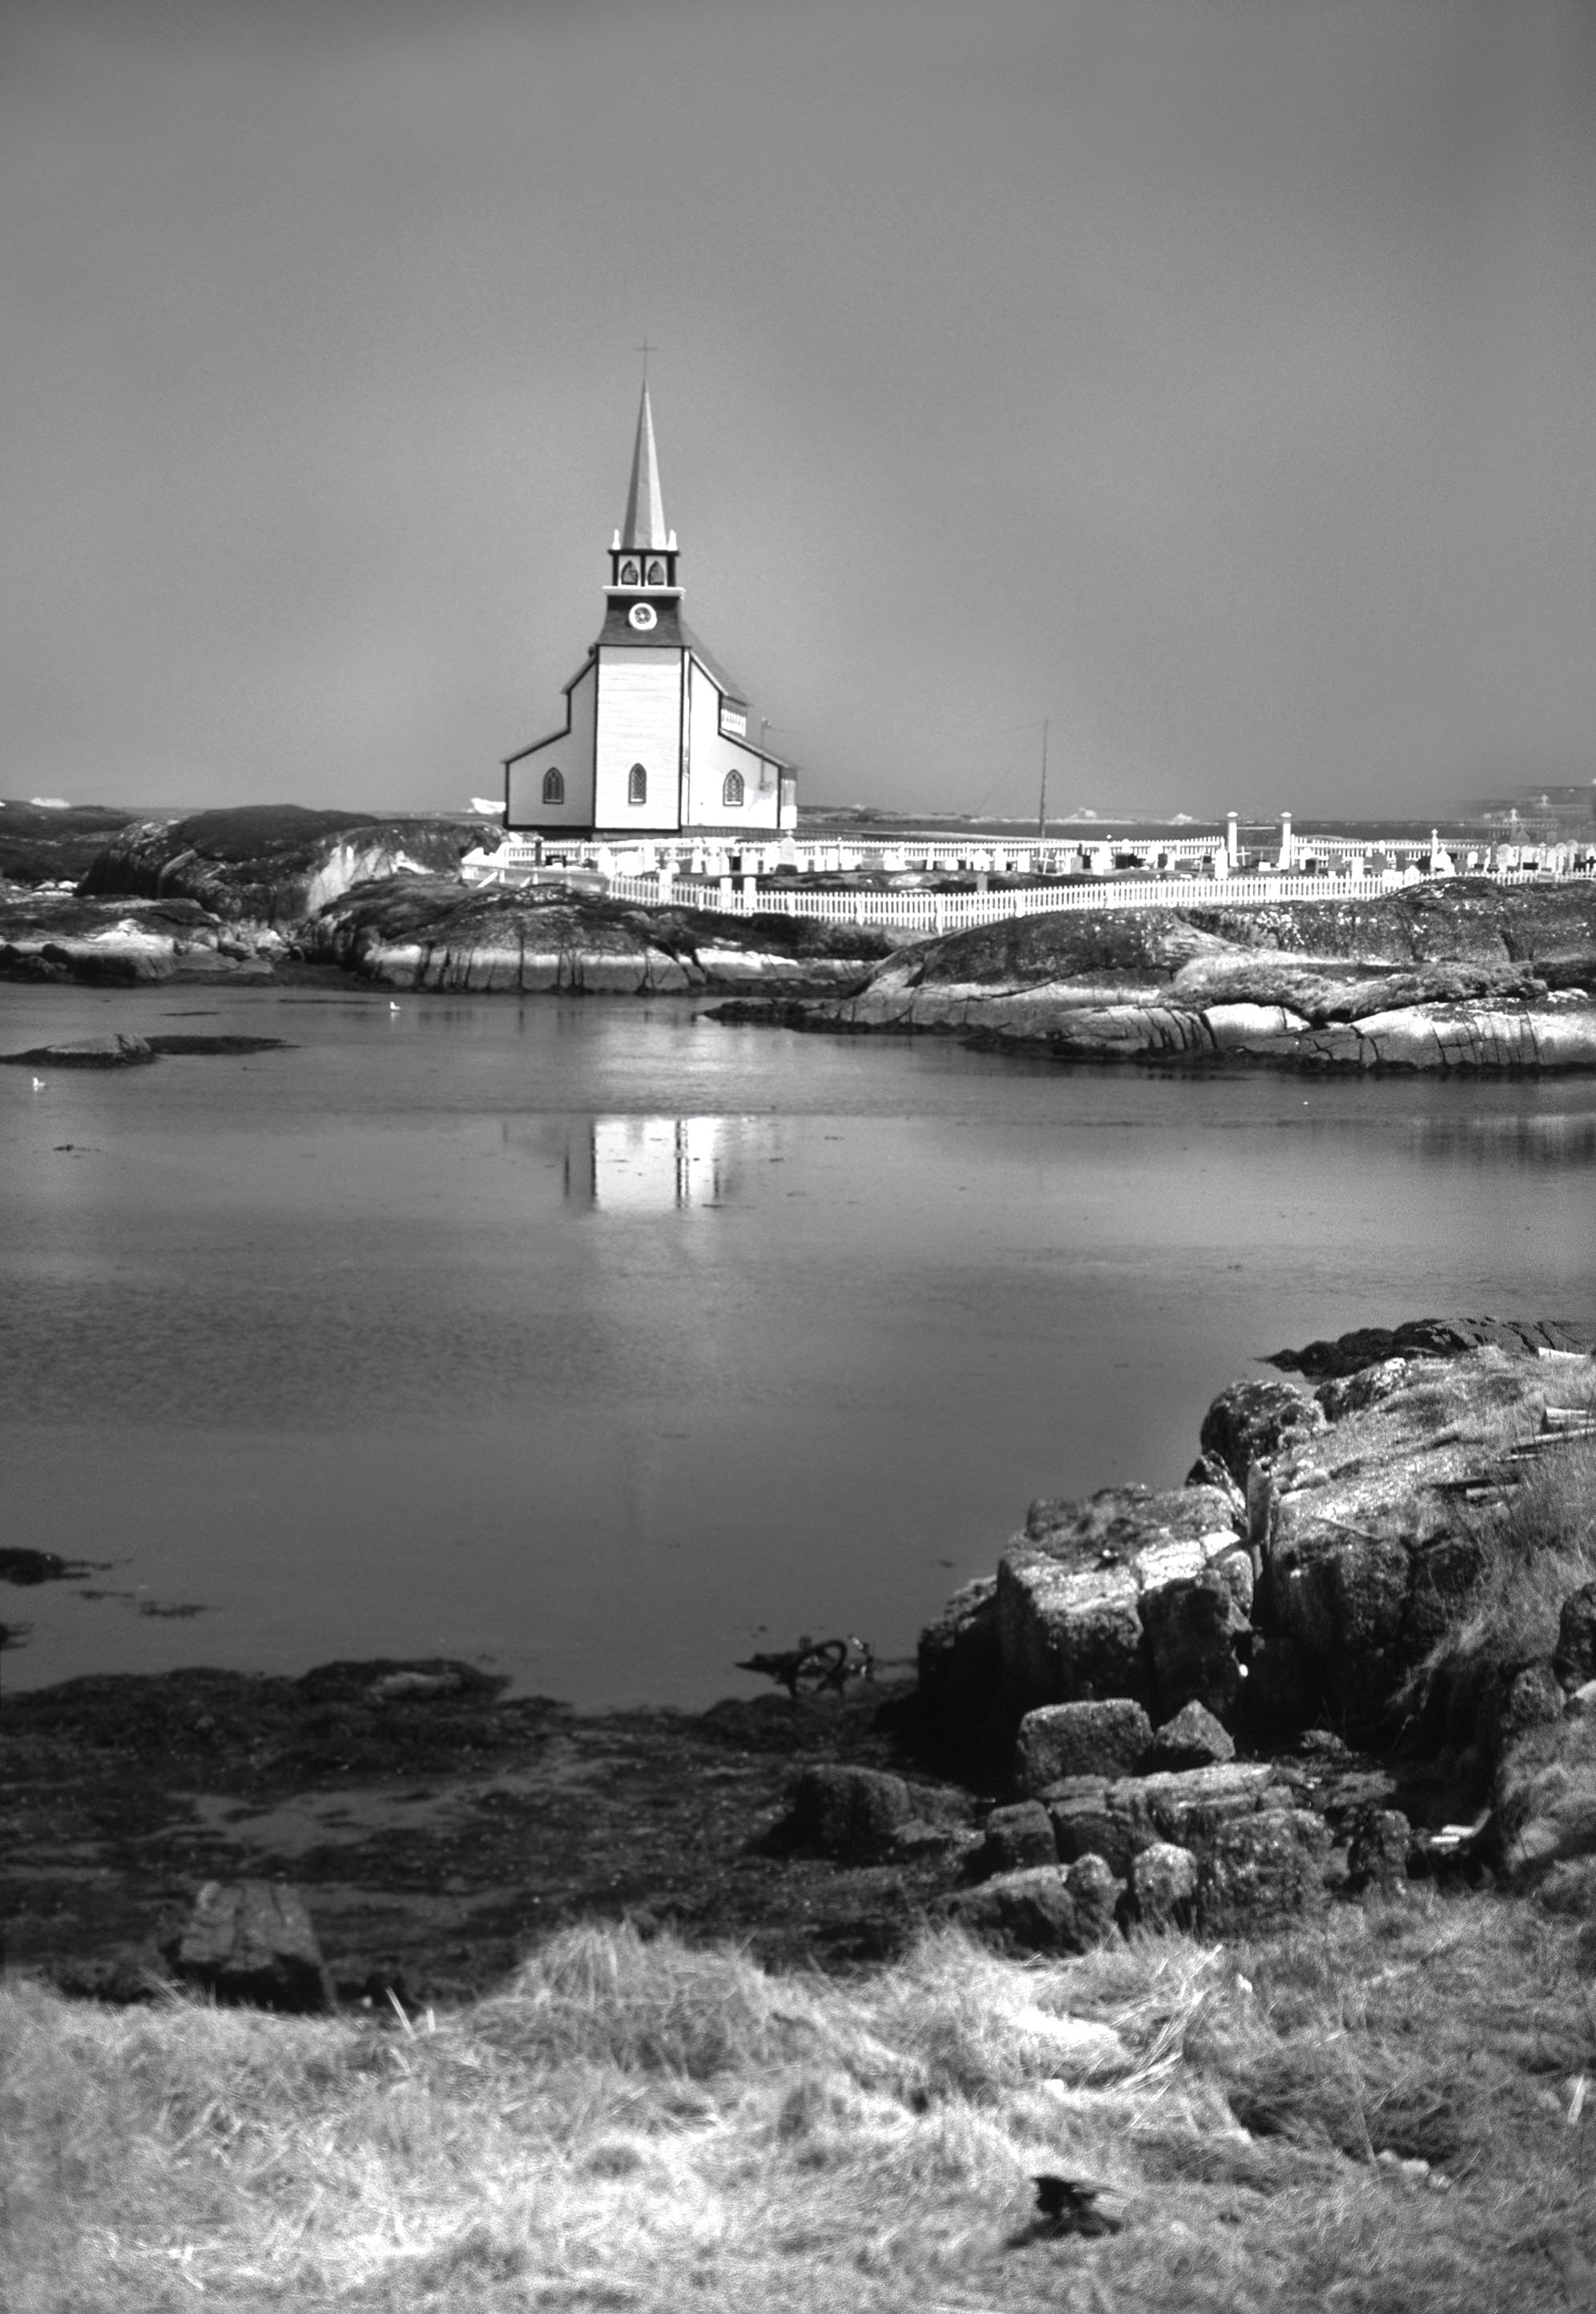 White Church Next to Body of Water